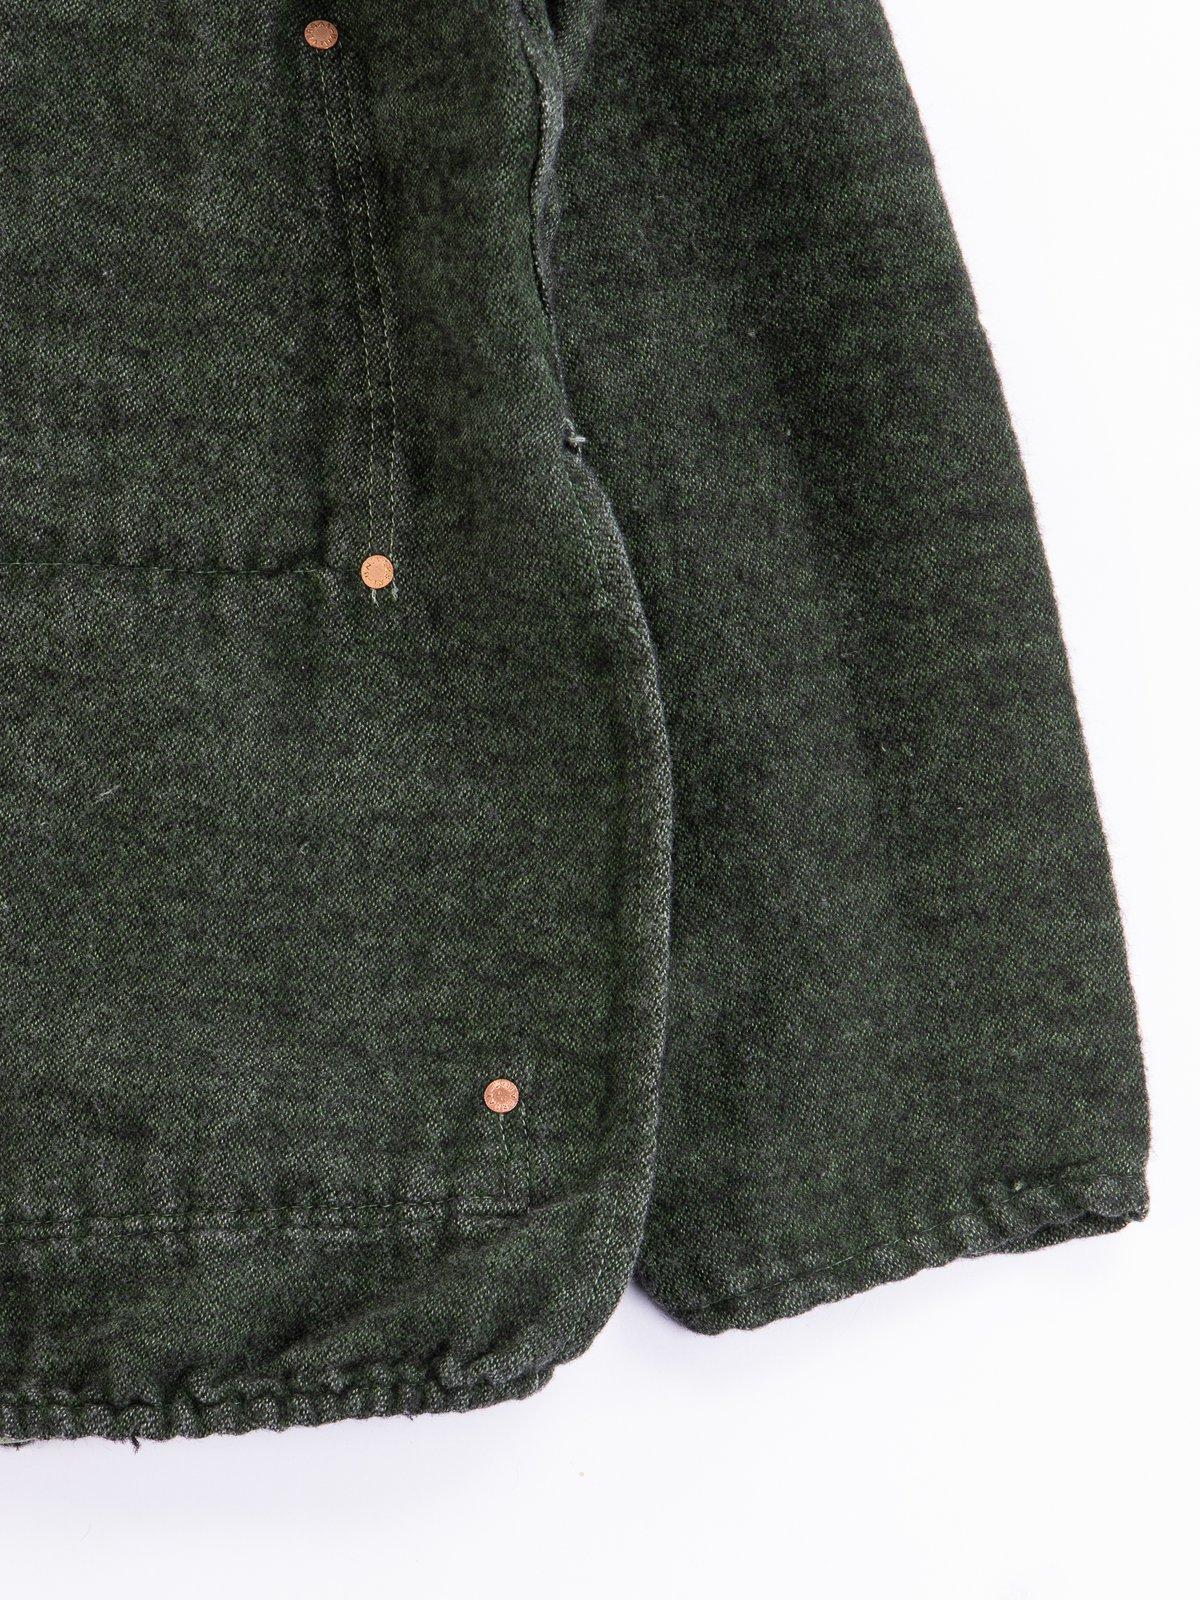 Viridian/Black Cotton/Mohair Janus Jacket - Image 3